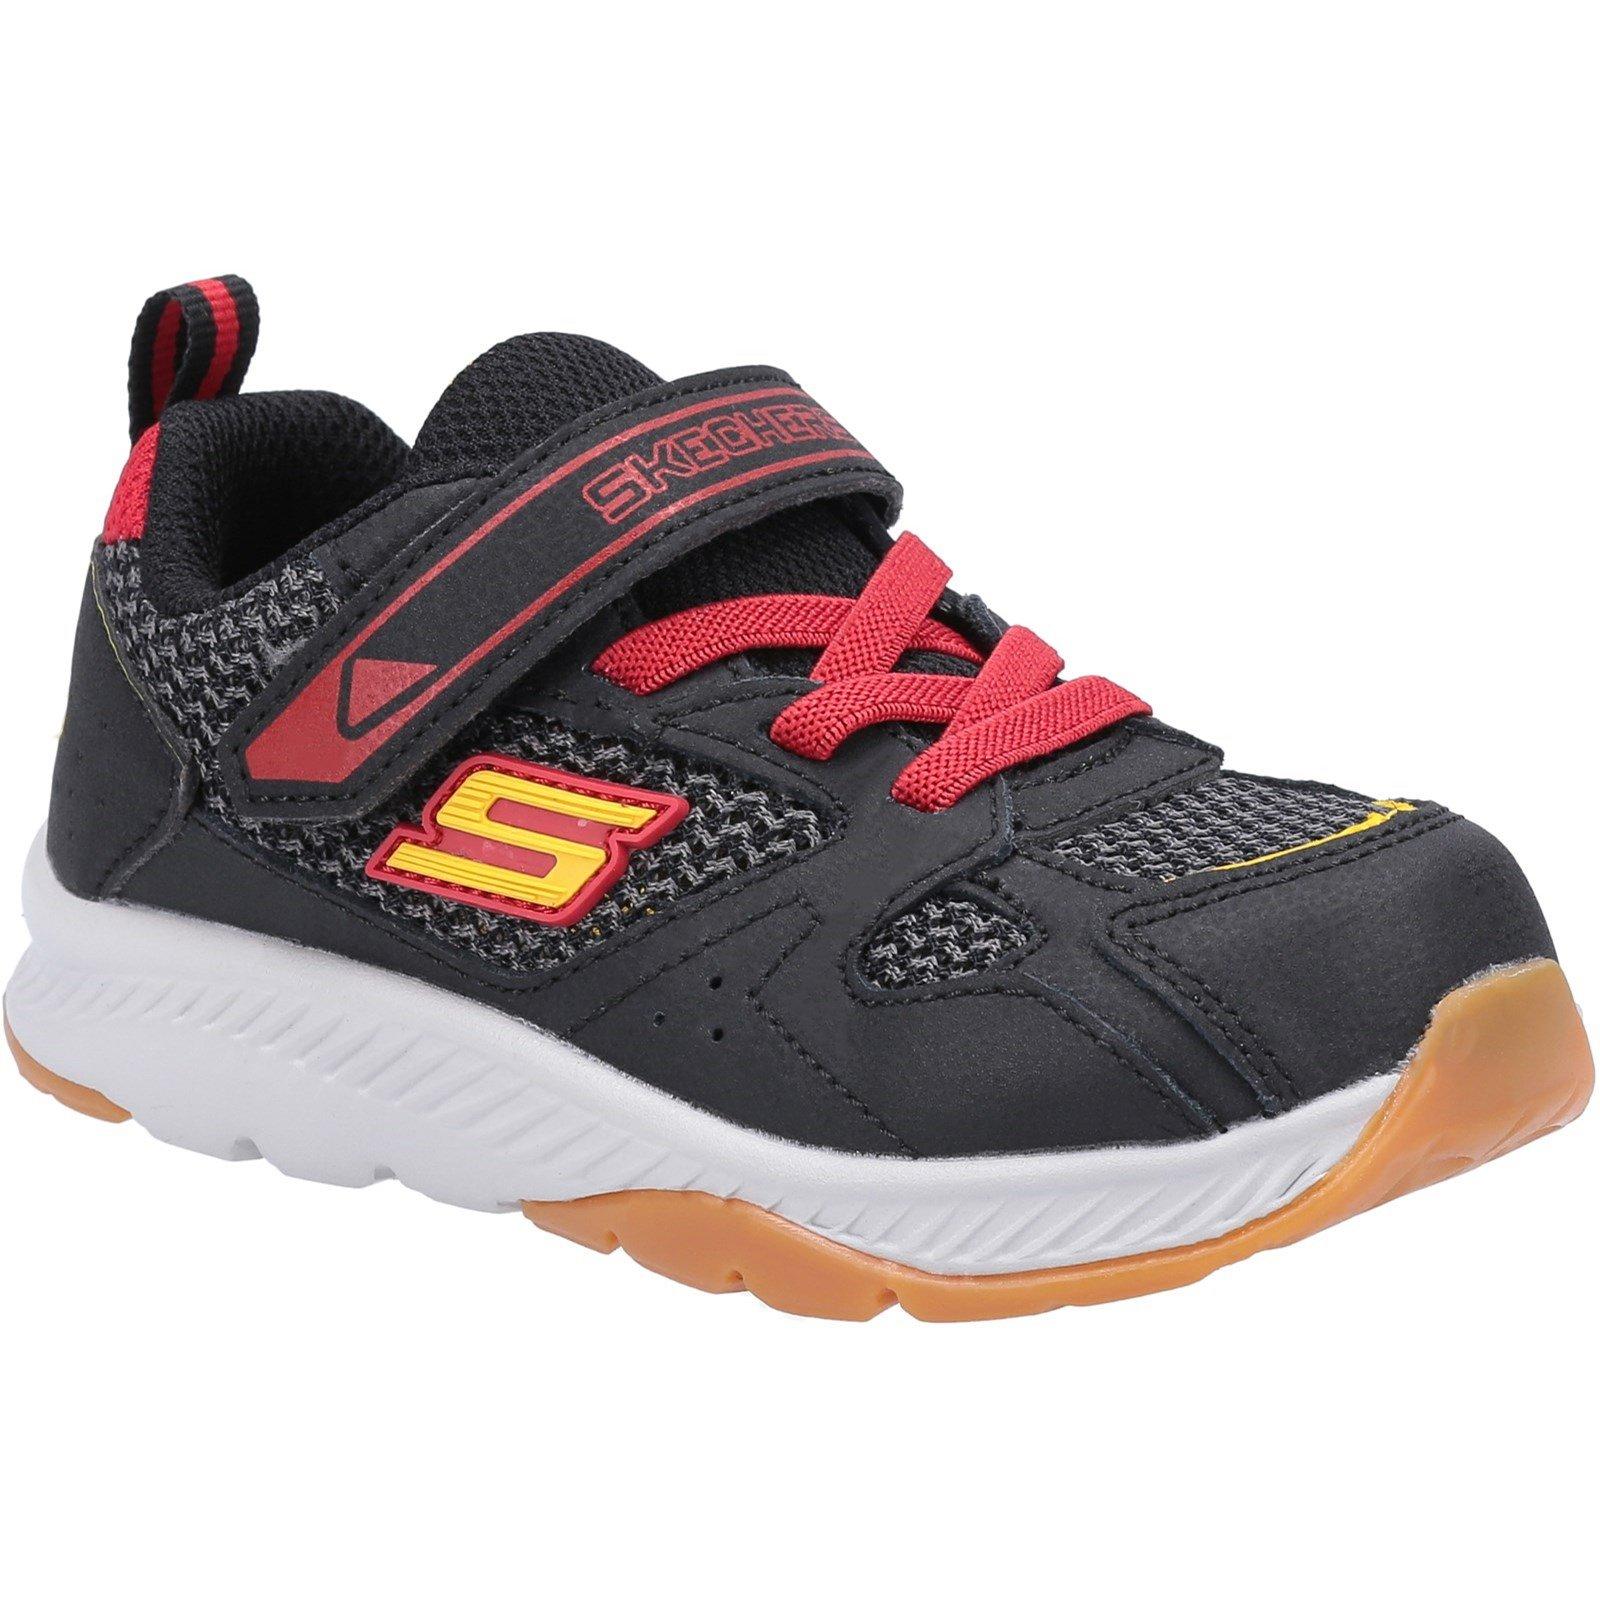 Skechers Kid's Comfy Grip Trainer Multicolor 30424 - Black/Red 8